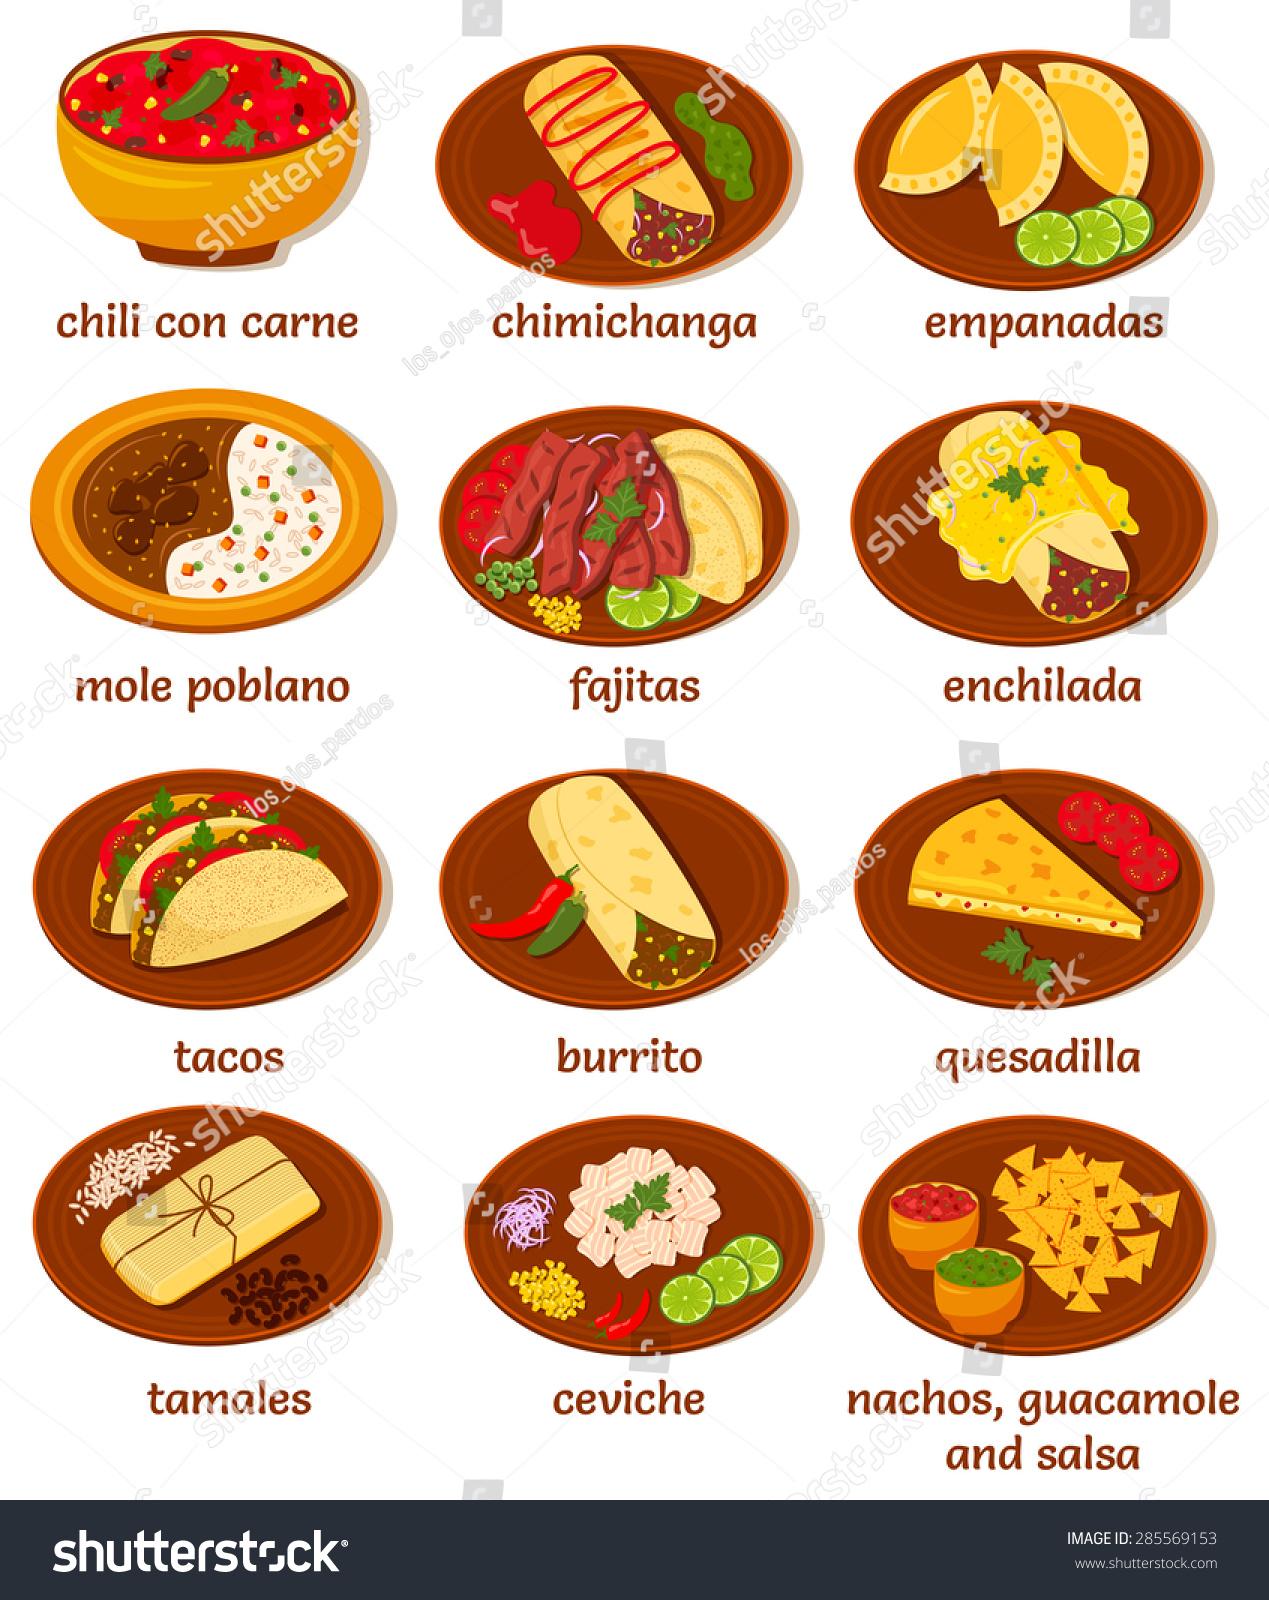 Chimichanga Food Menu